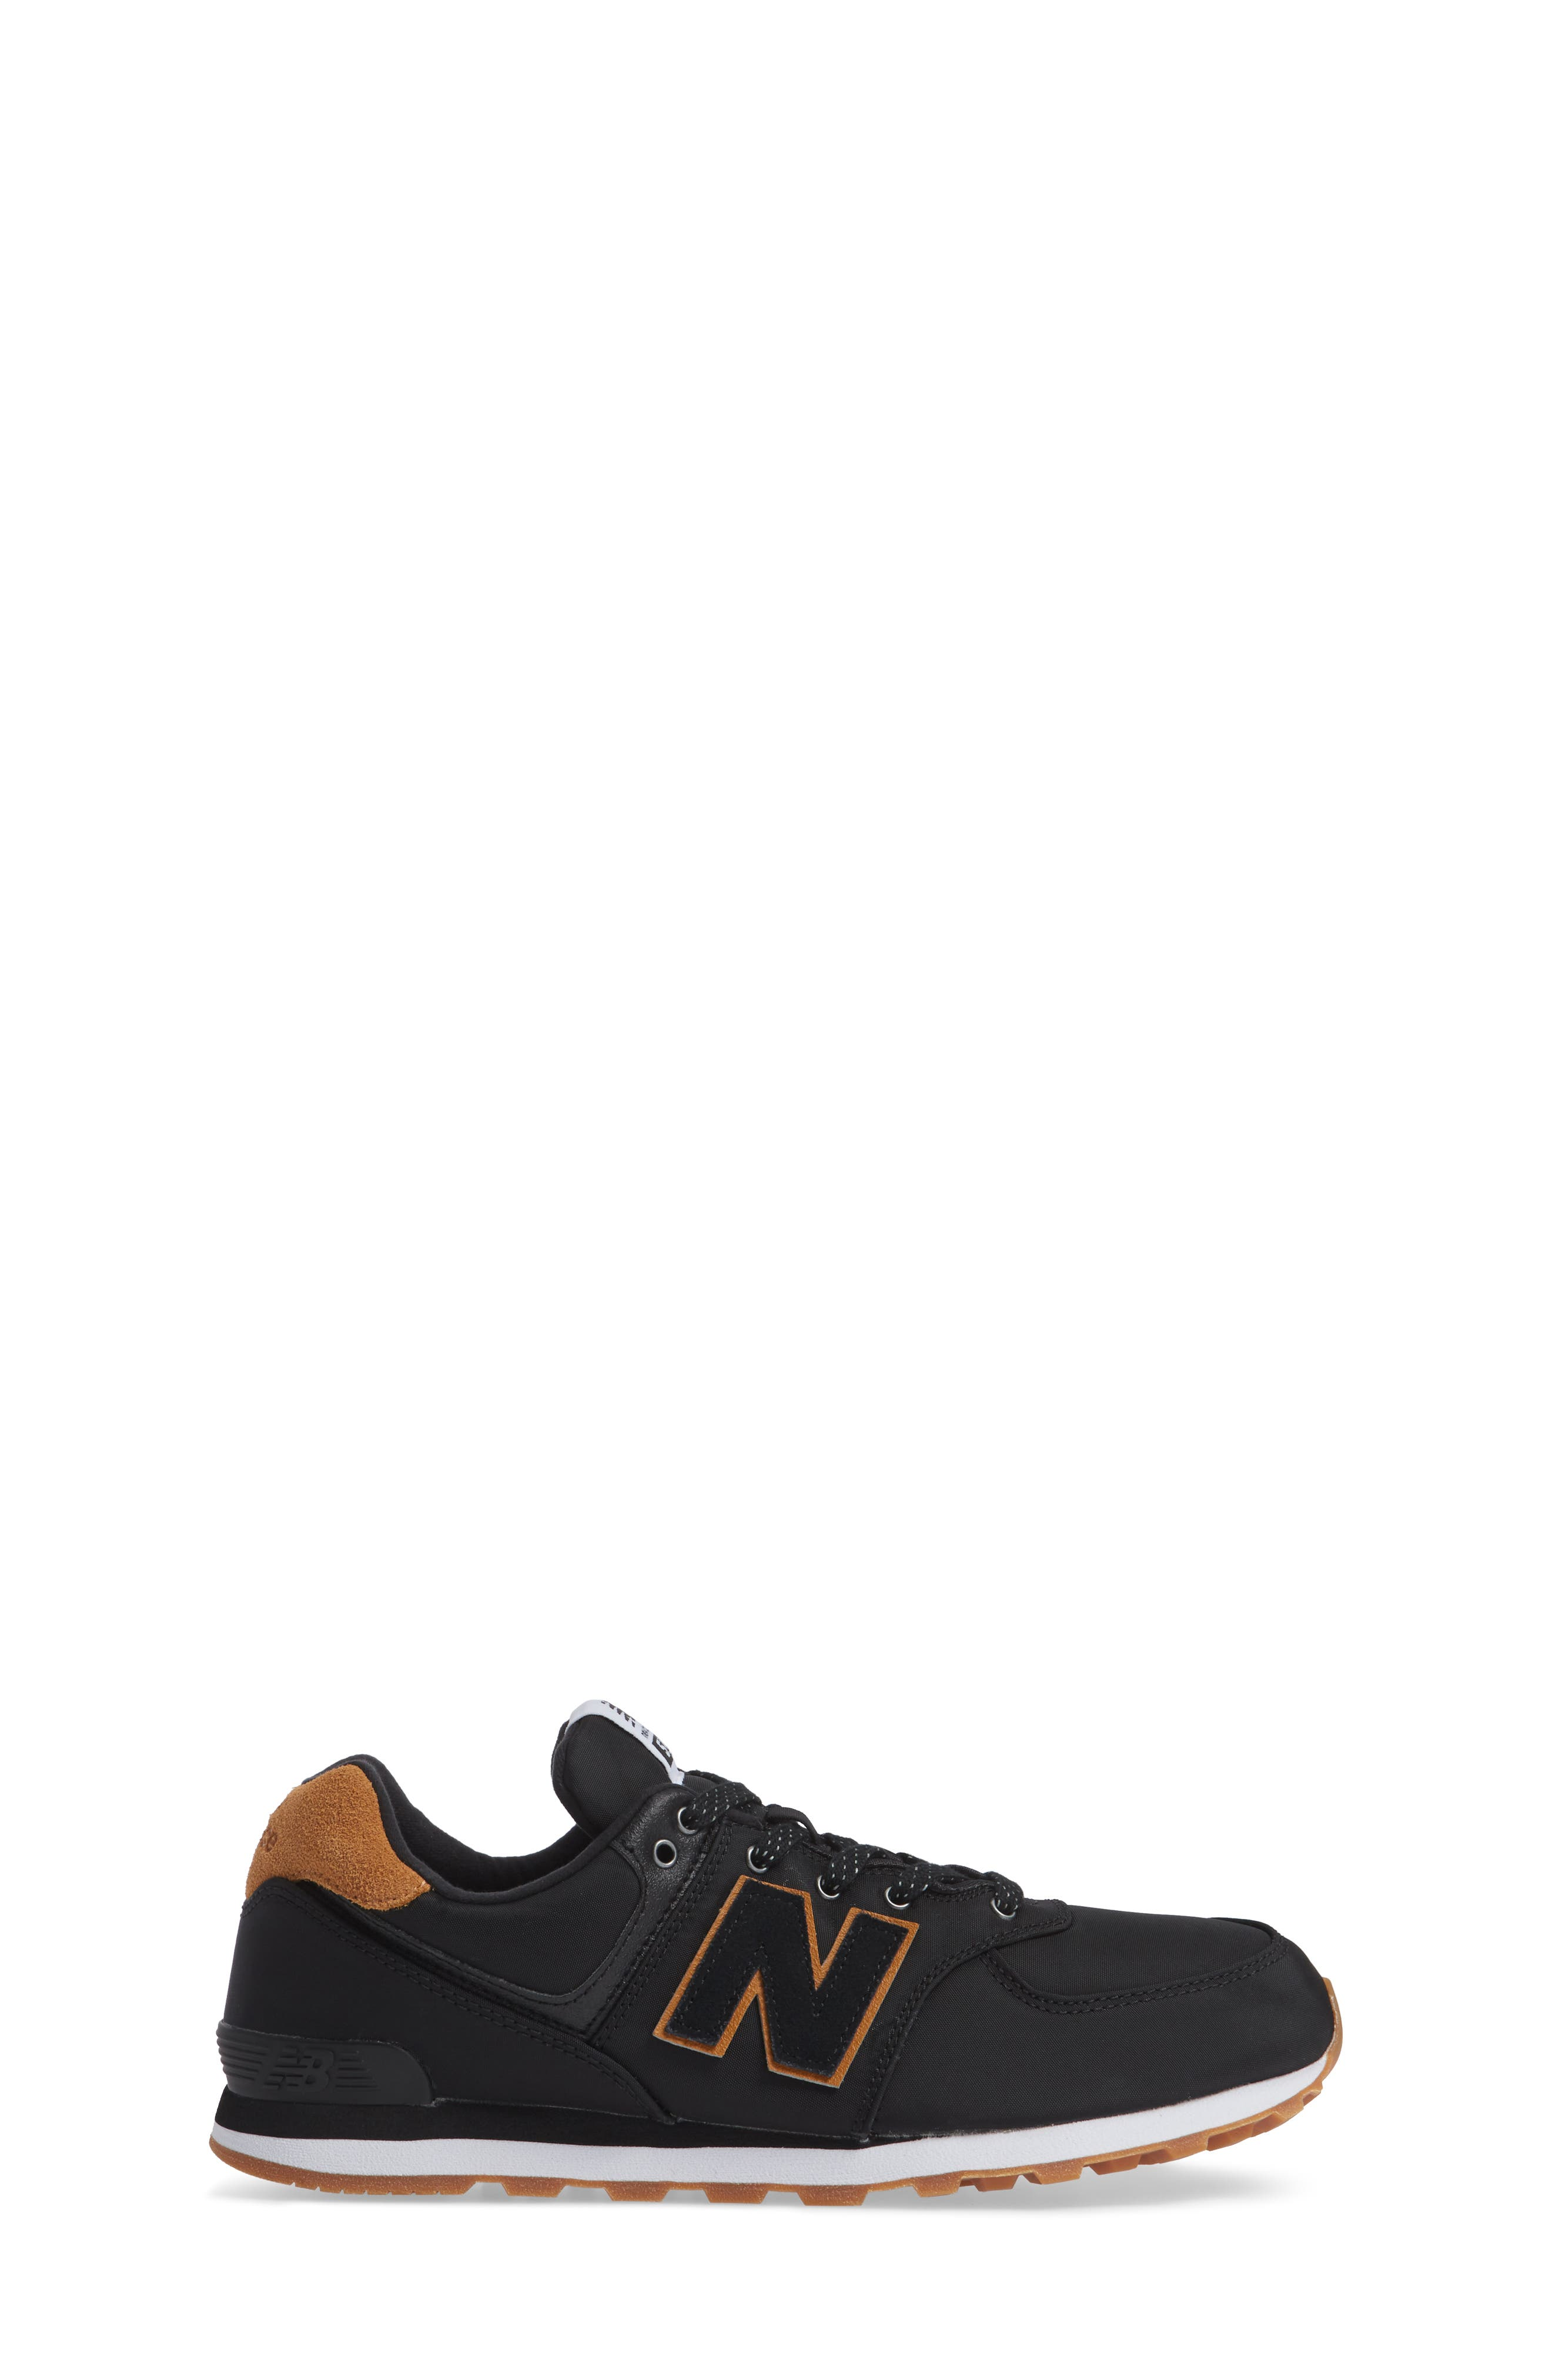 574 Essentials Sneaker,                             Alternate thumbnail 3, color,                             BLACK/ WHITE